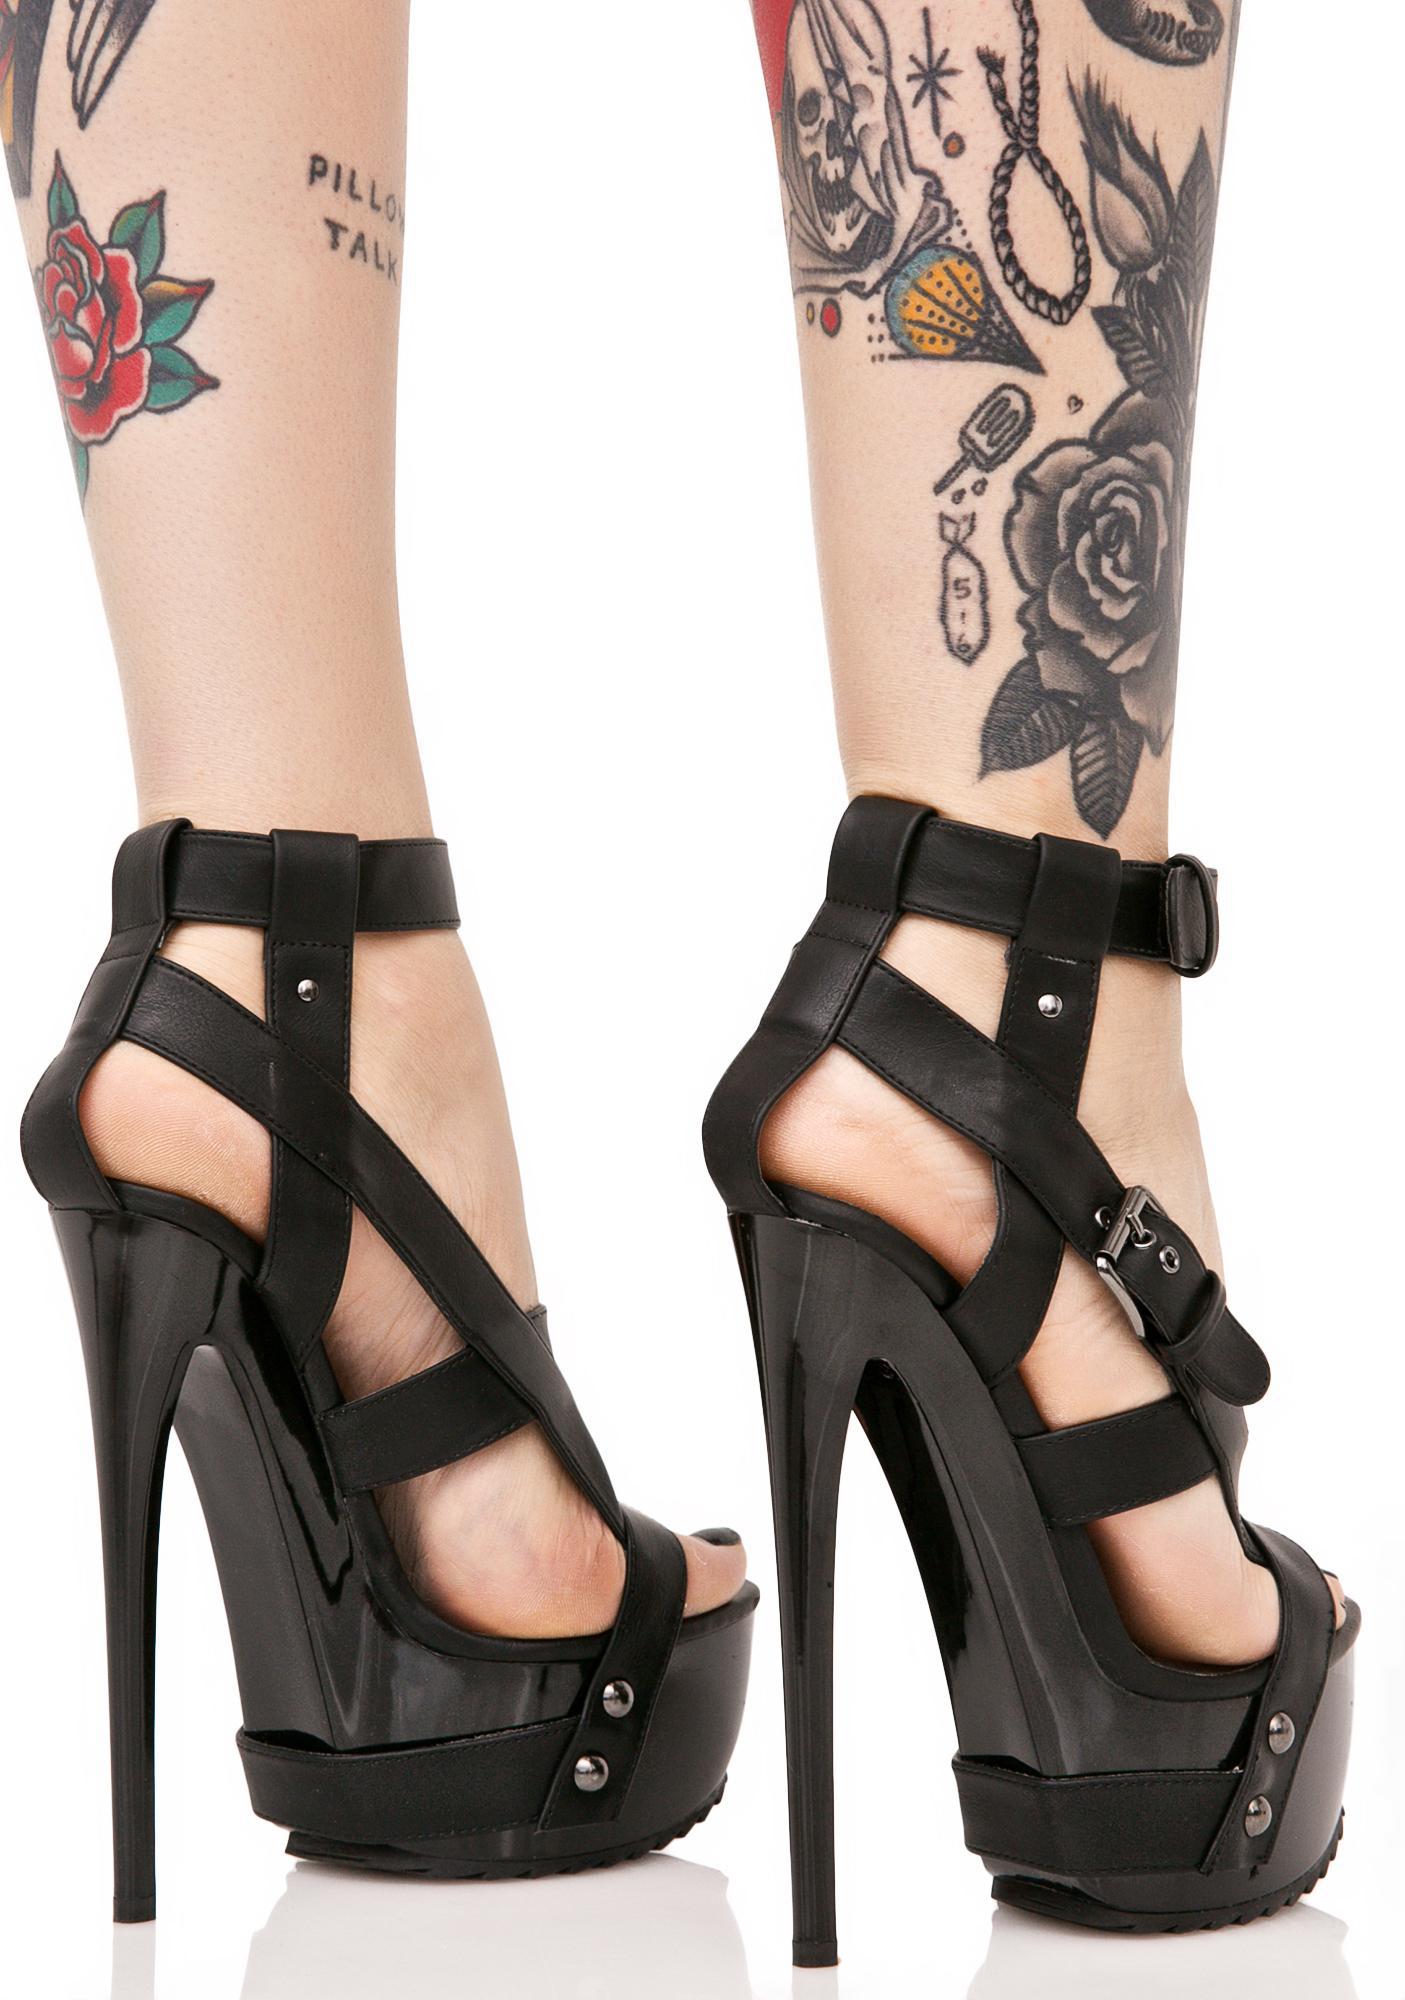 Y.R.U. X Buckled Heels